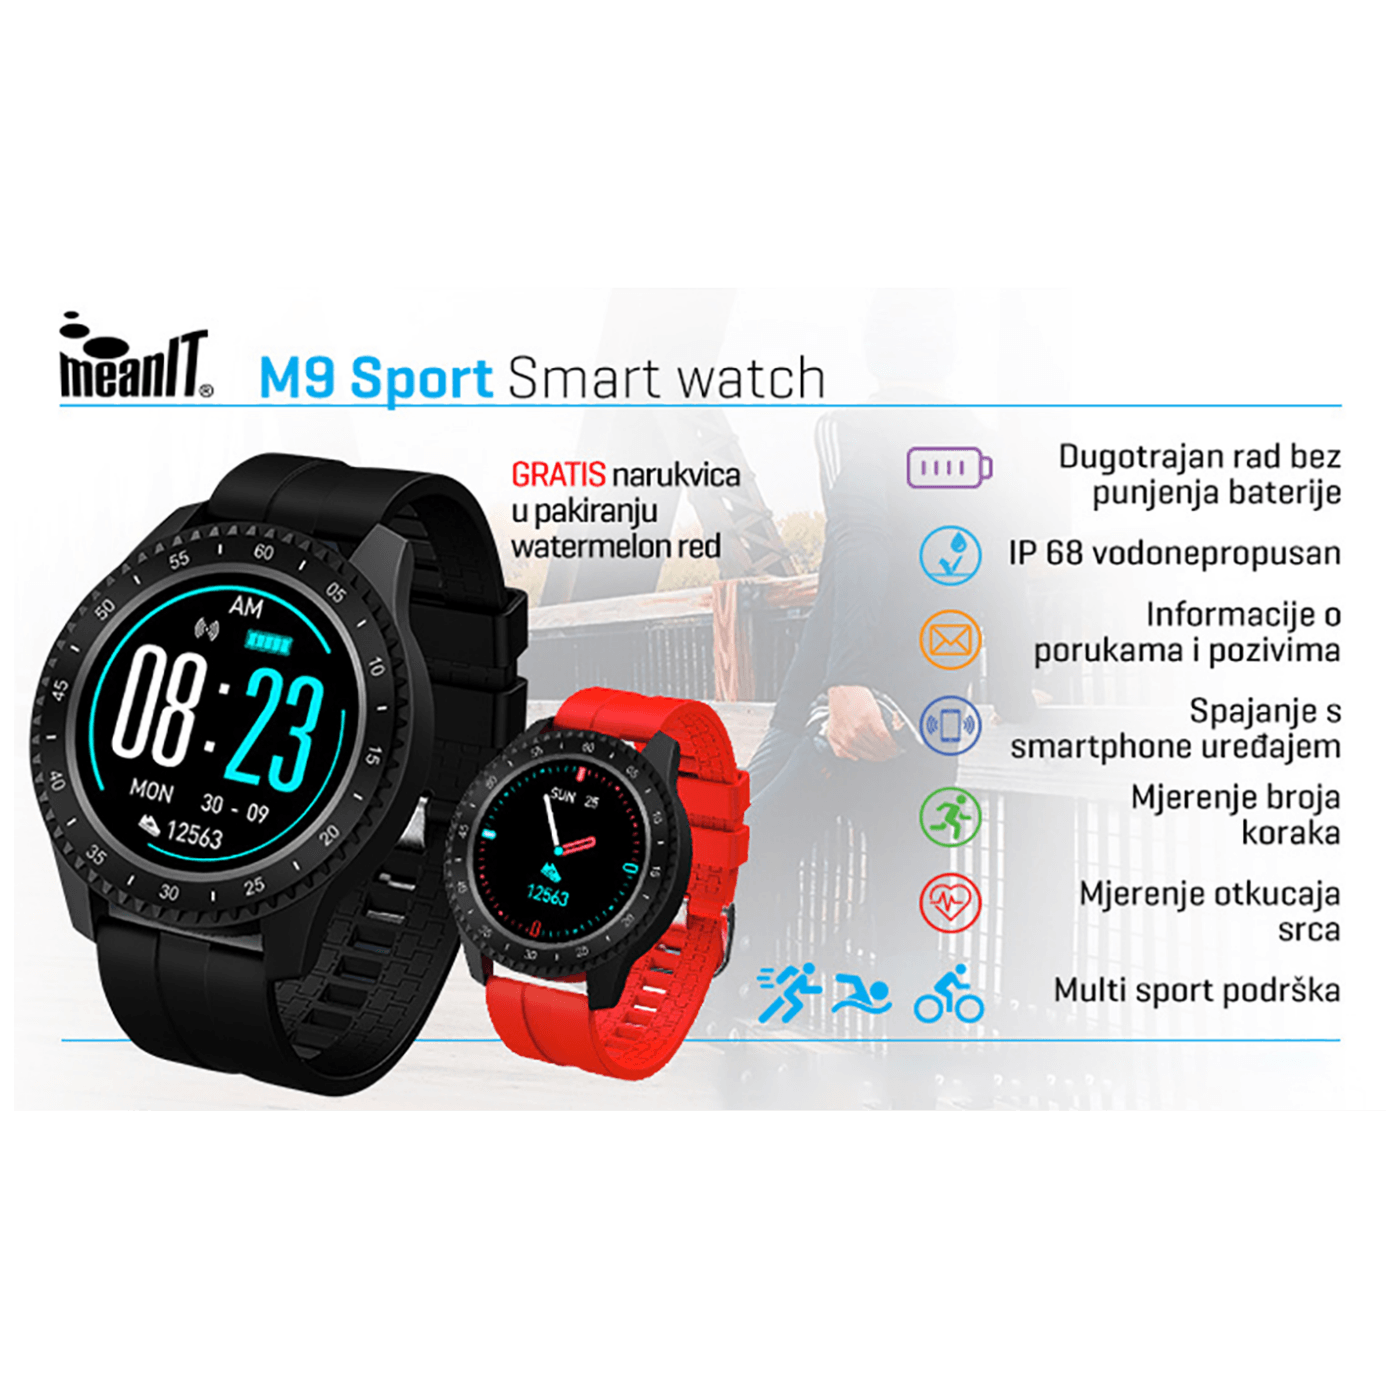 M9 Sport